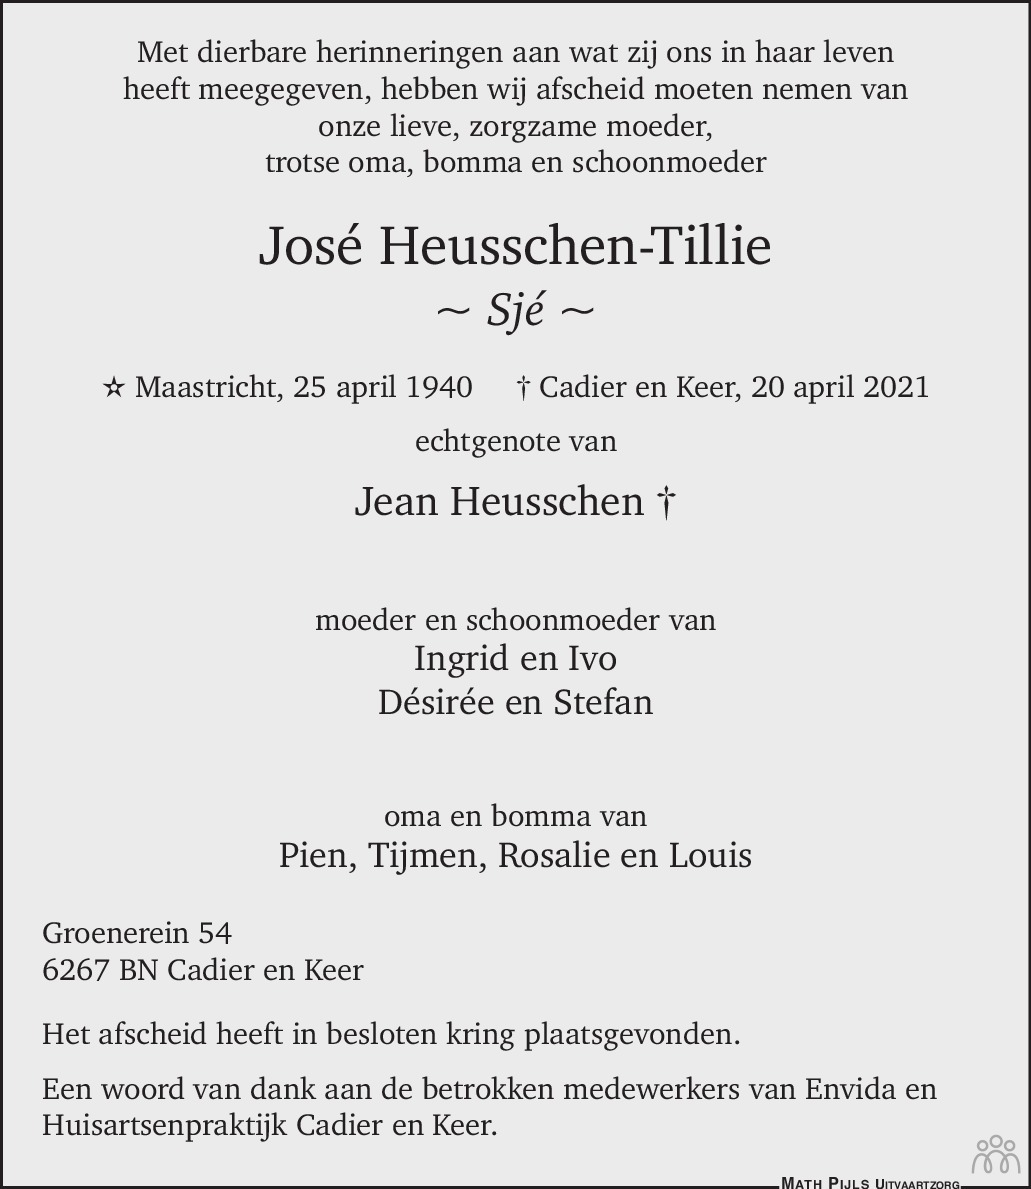 Overlijdensbericht van José (Sjé) Heusschen-Tillie in De Limburger